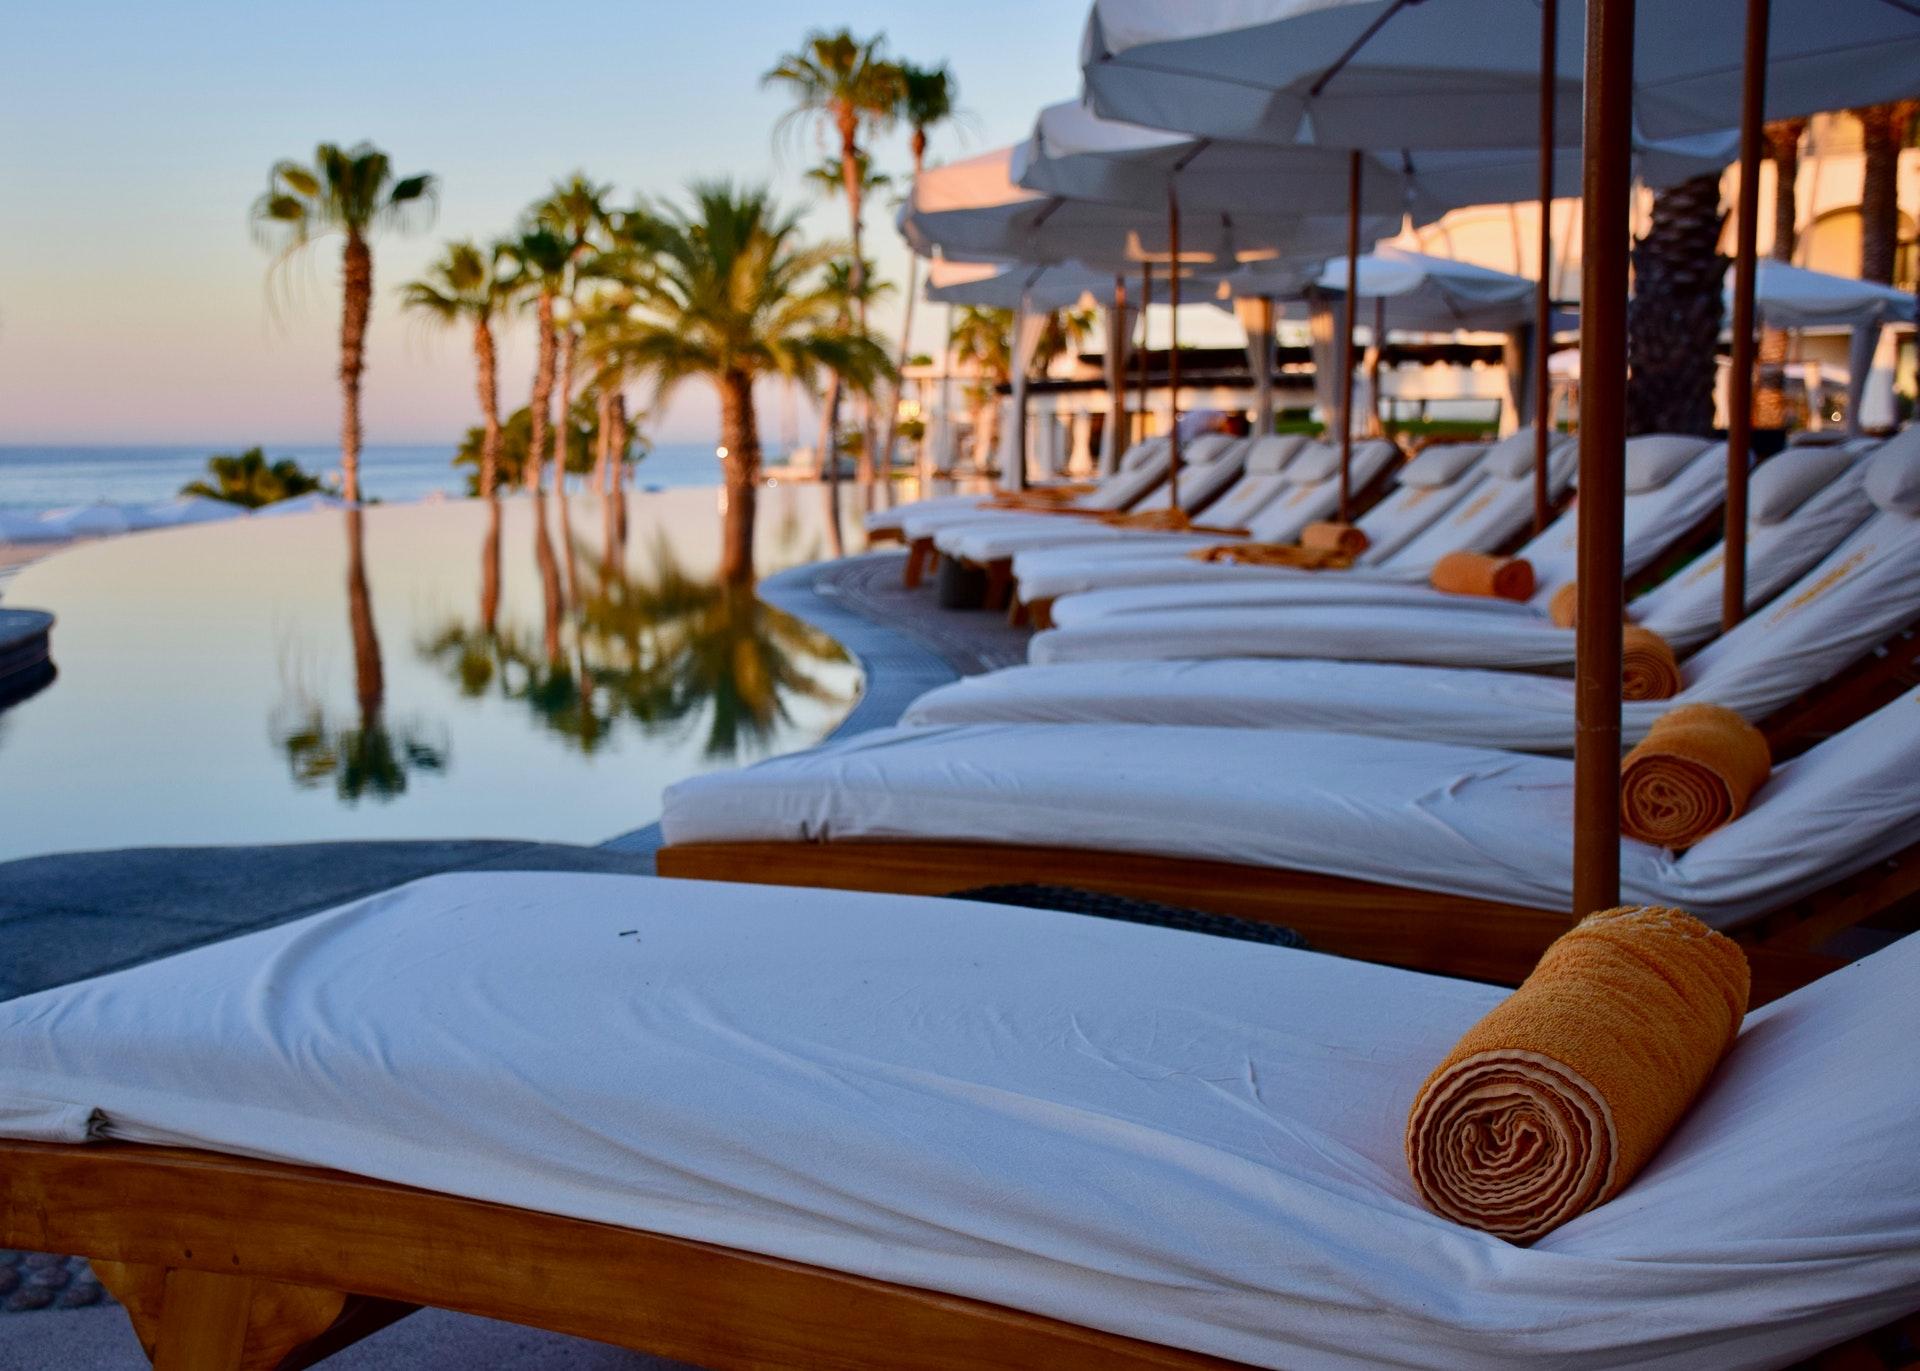 Hotel Architecture, Hotel Design, Hotel Construction